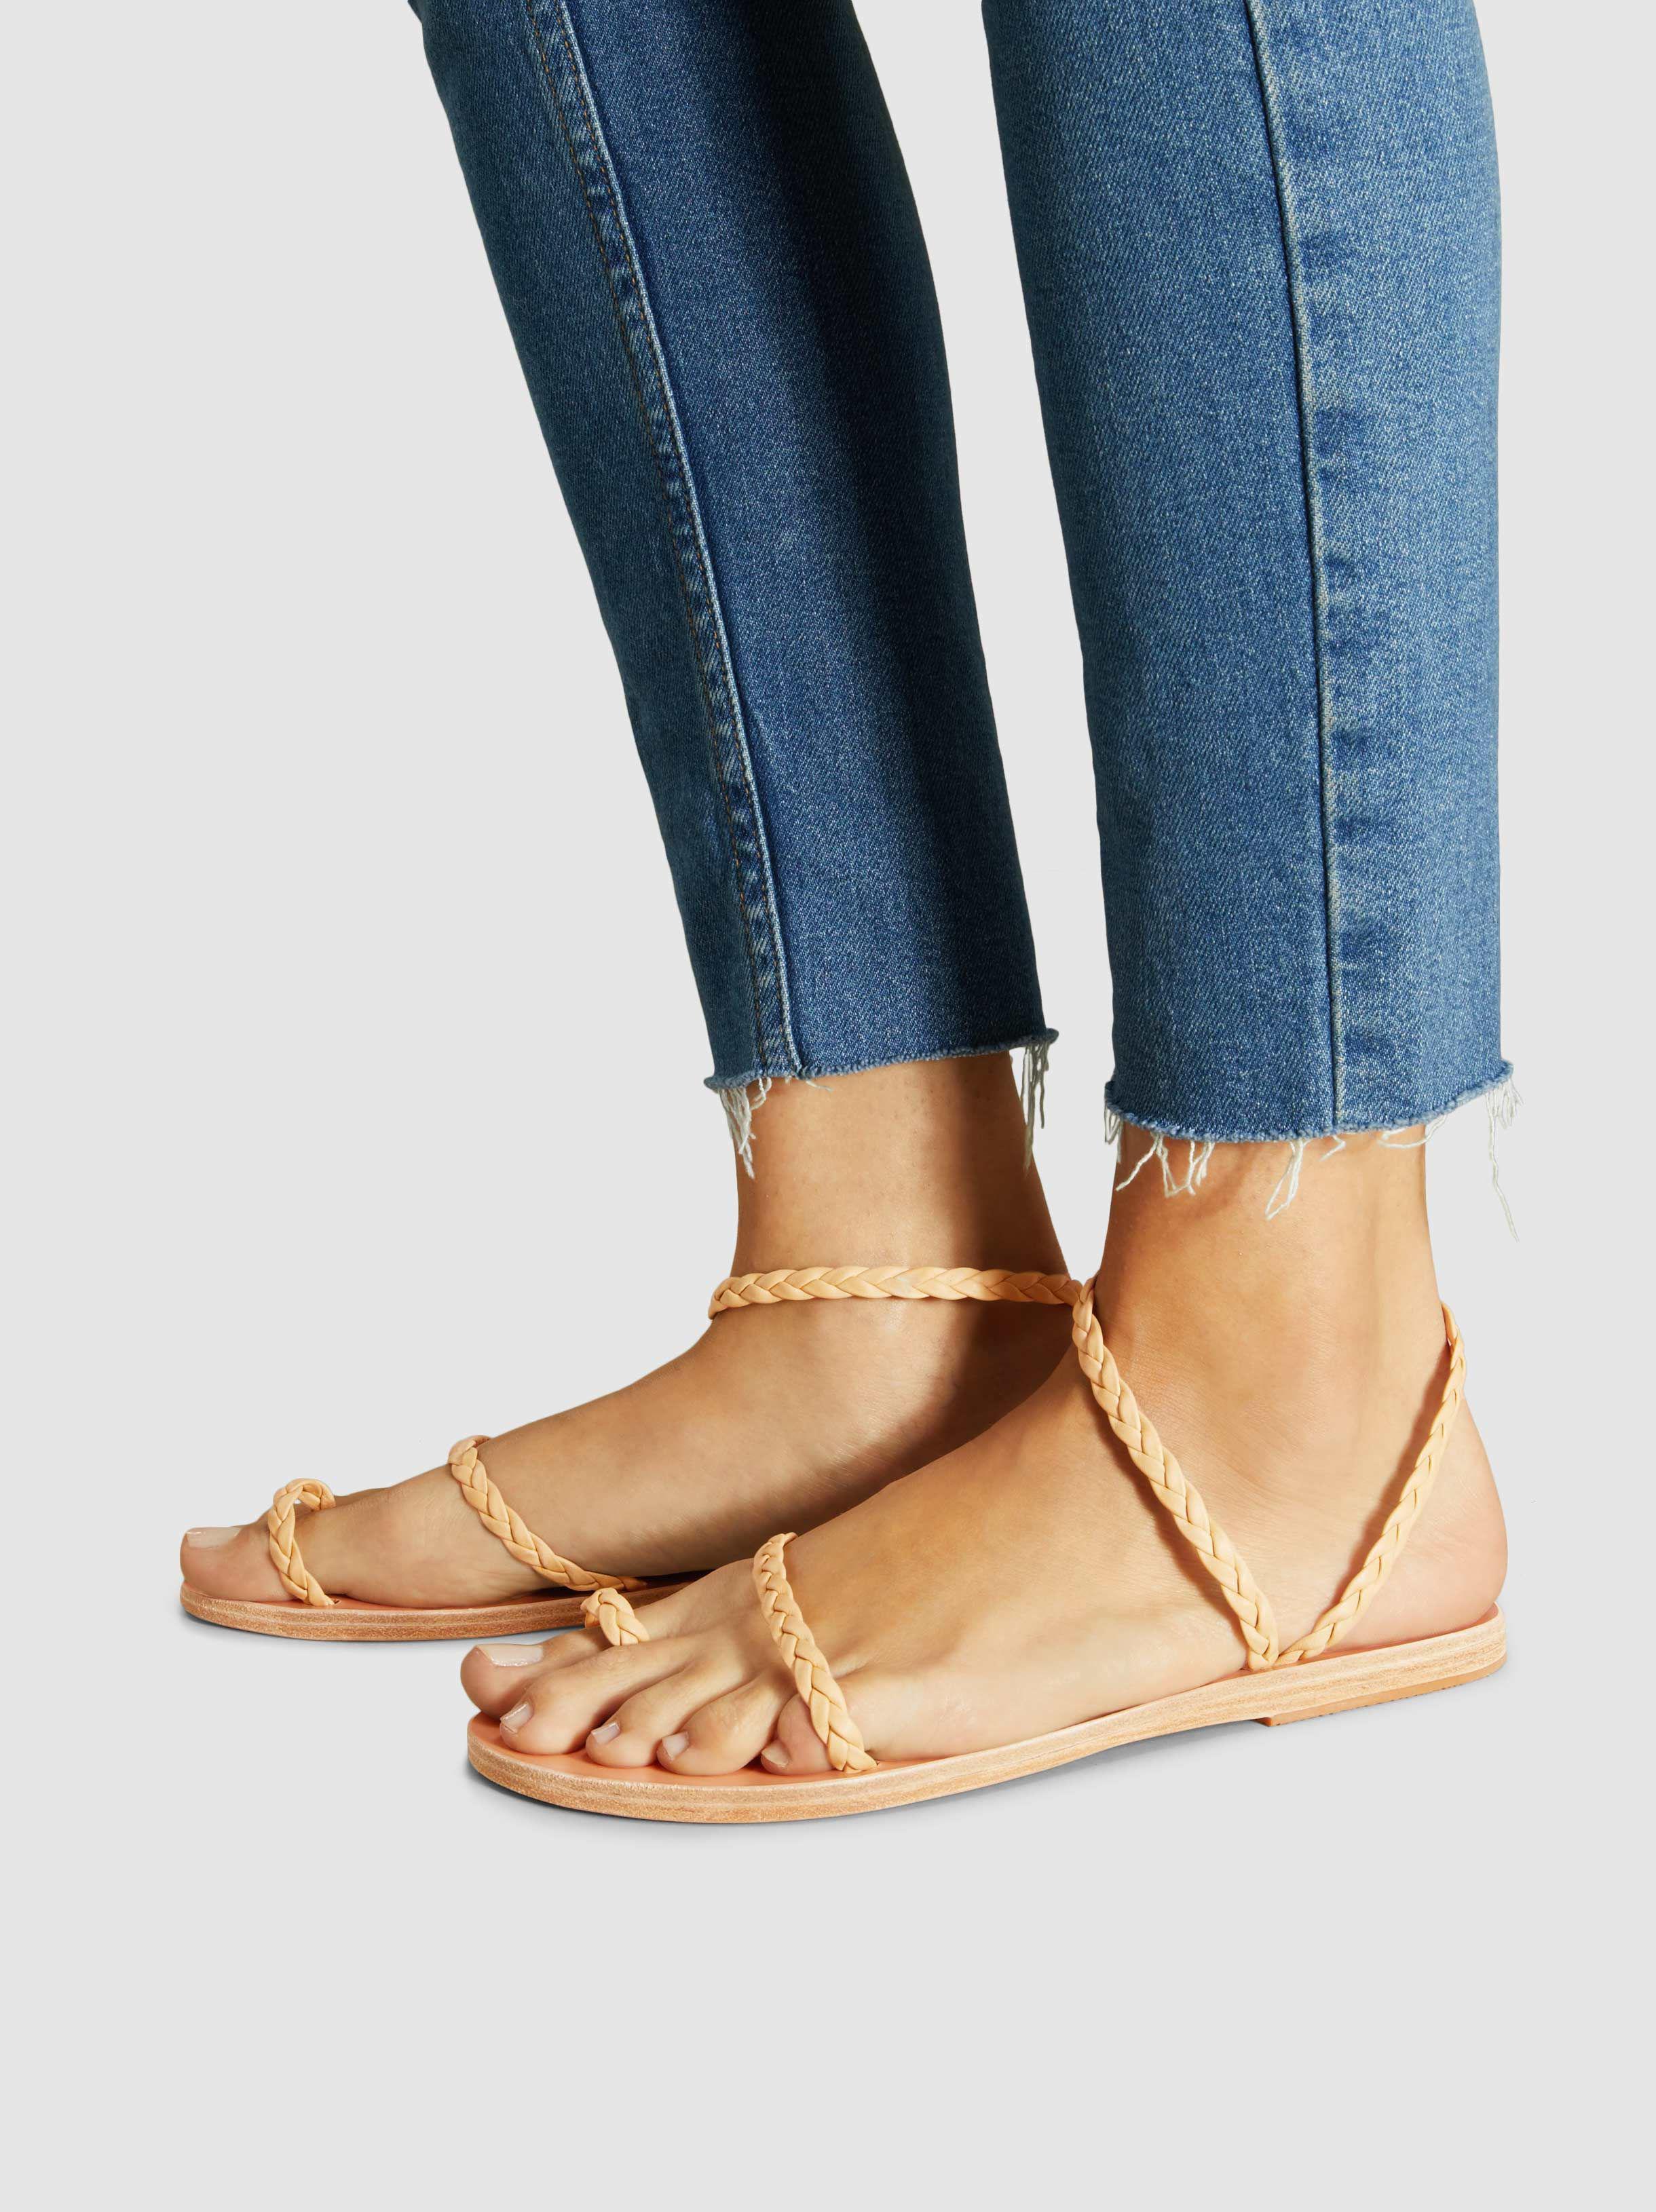 7e451057a2a009 Ancient Greek Sandals - Multicolor Eleftheria Nappa Leather Sandals - Lyst.  View fullscreen